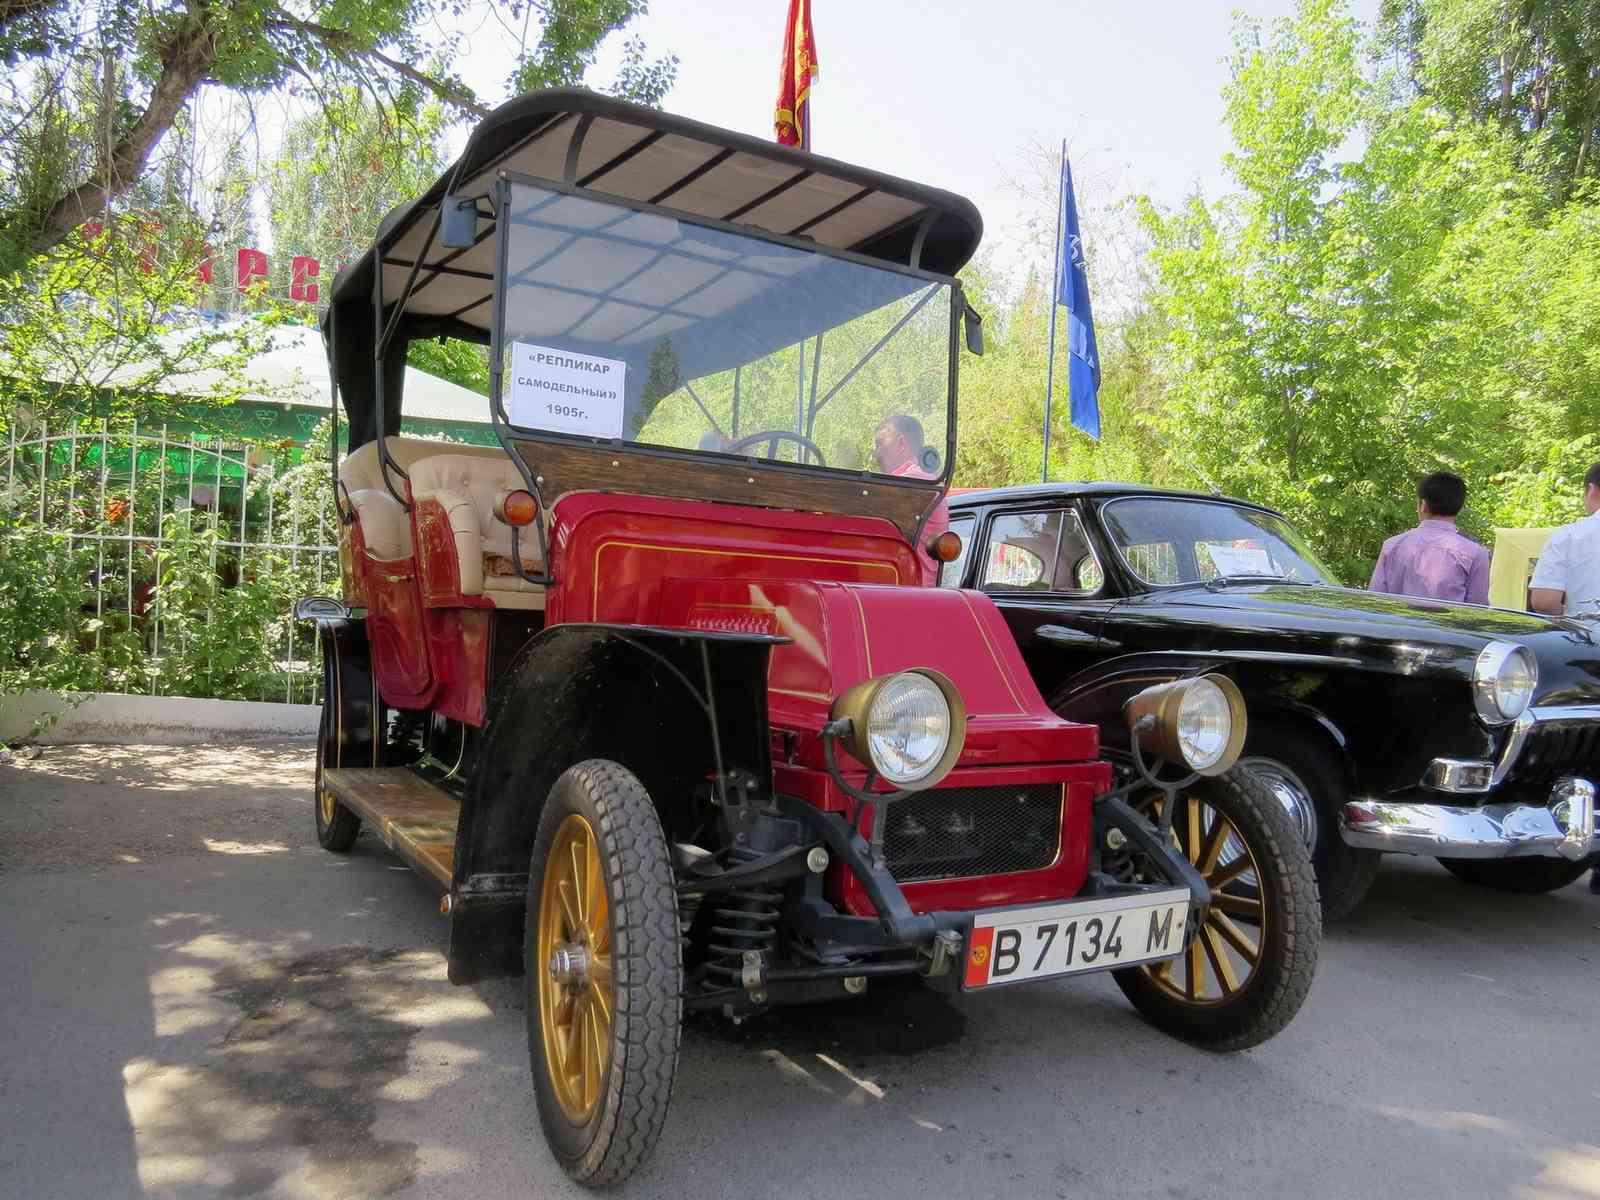 2000..... САМАВТО. Кыргызстан. Бишкек. Х. Х. B 7134 M